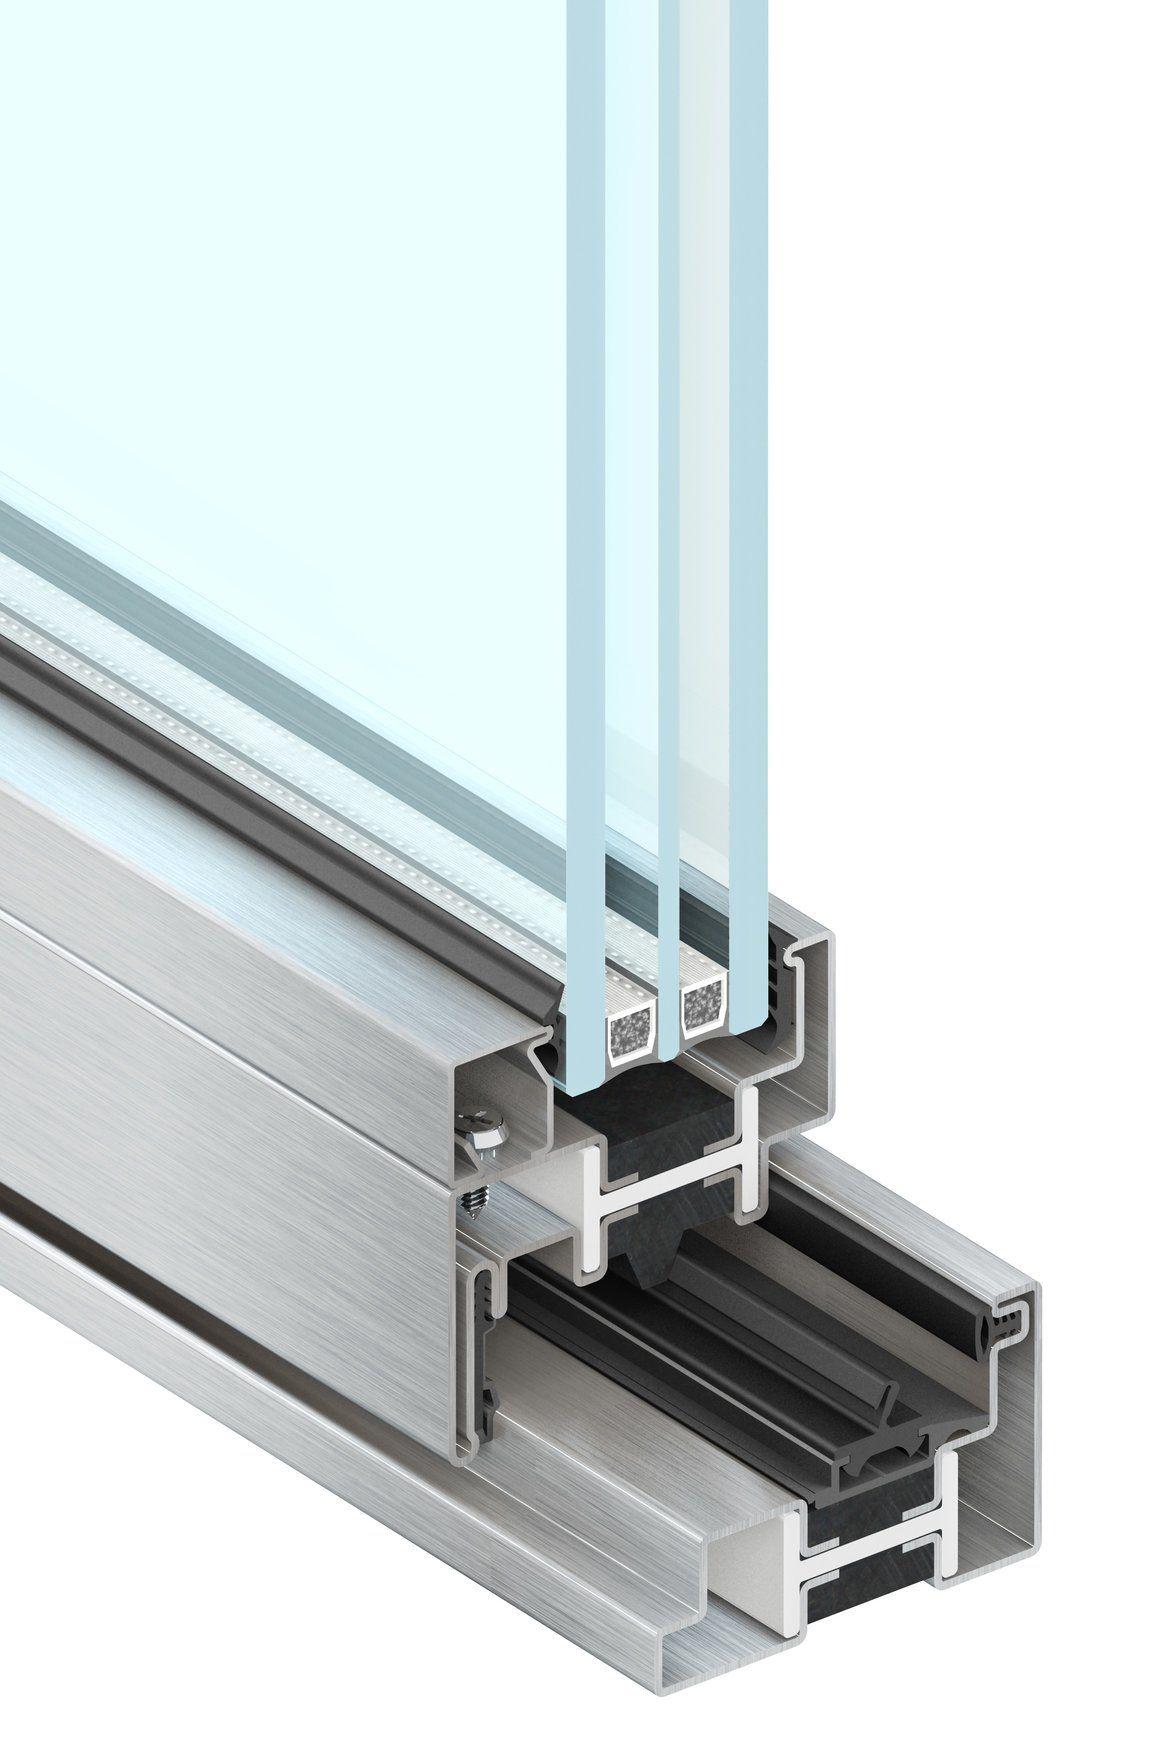 Tekla Porte E Finestre frame os2 - comep steel windows and doors